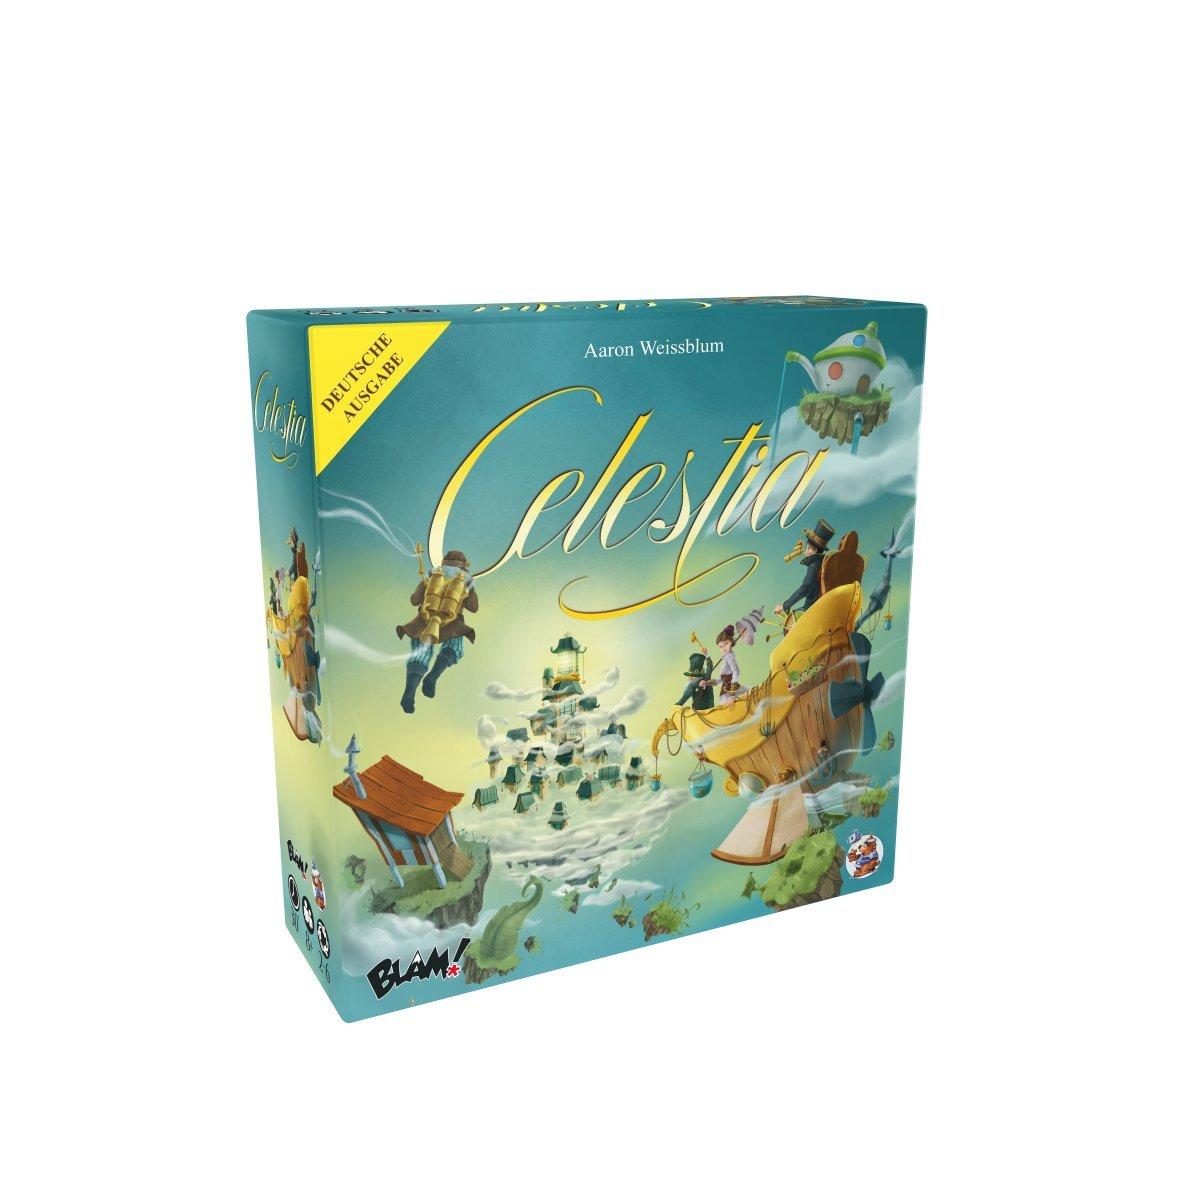 Heidelberger HE814 - Celestia, Spiele und Puzzles